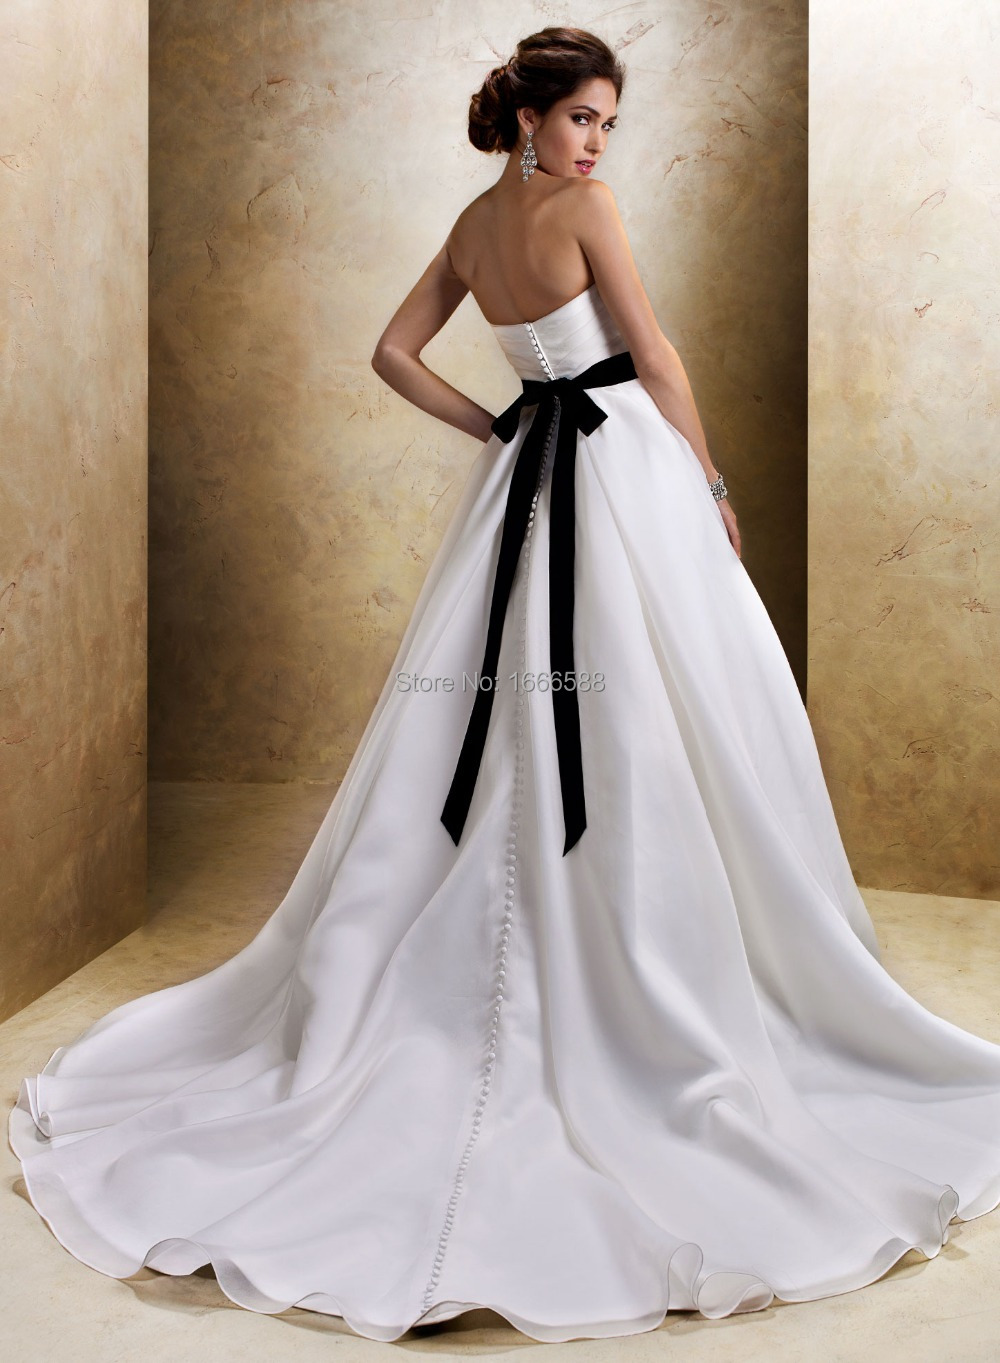 White wedding dress with black sash